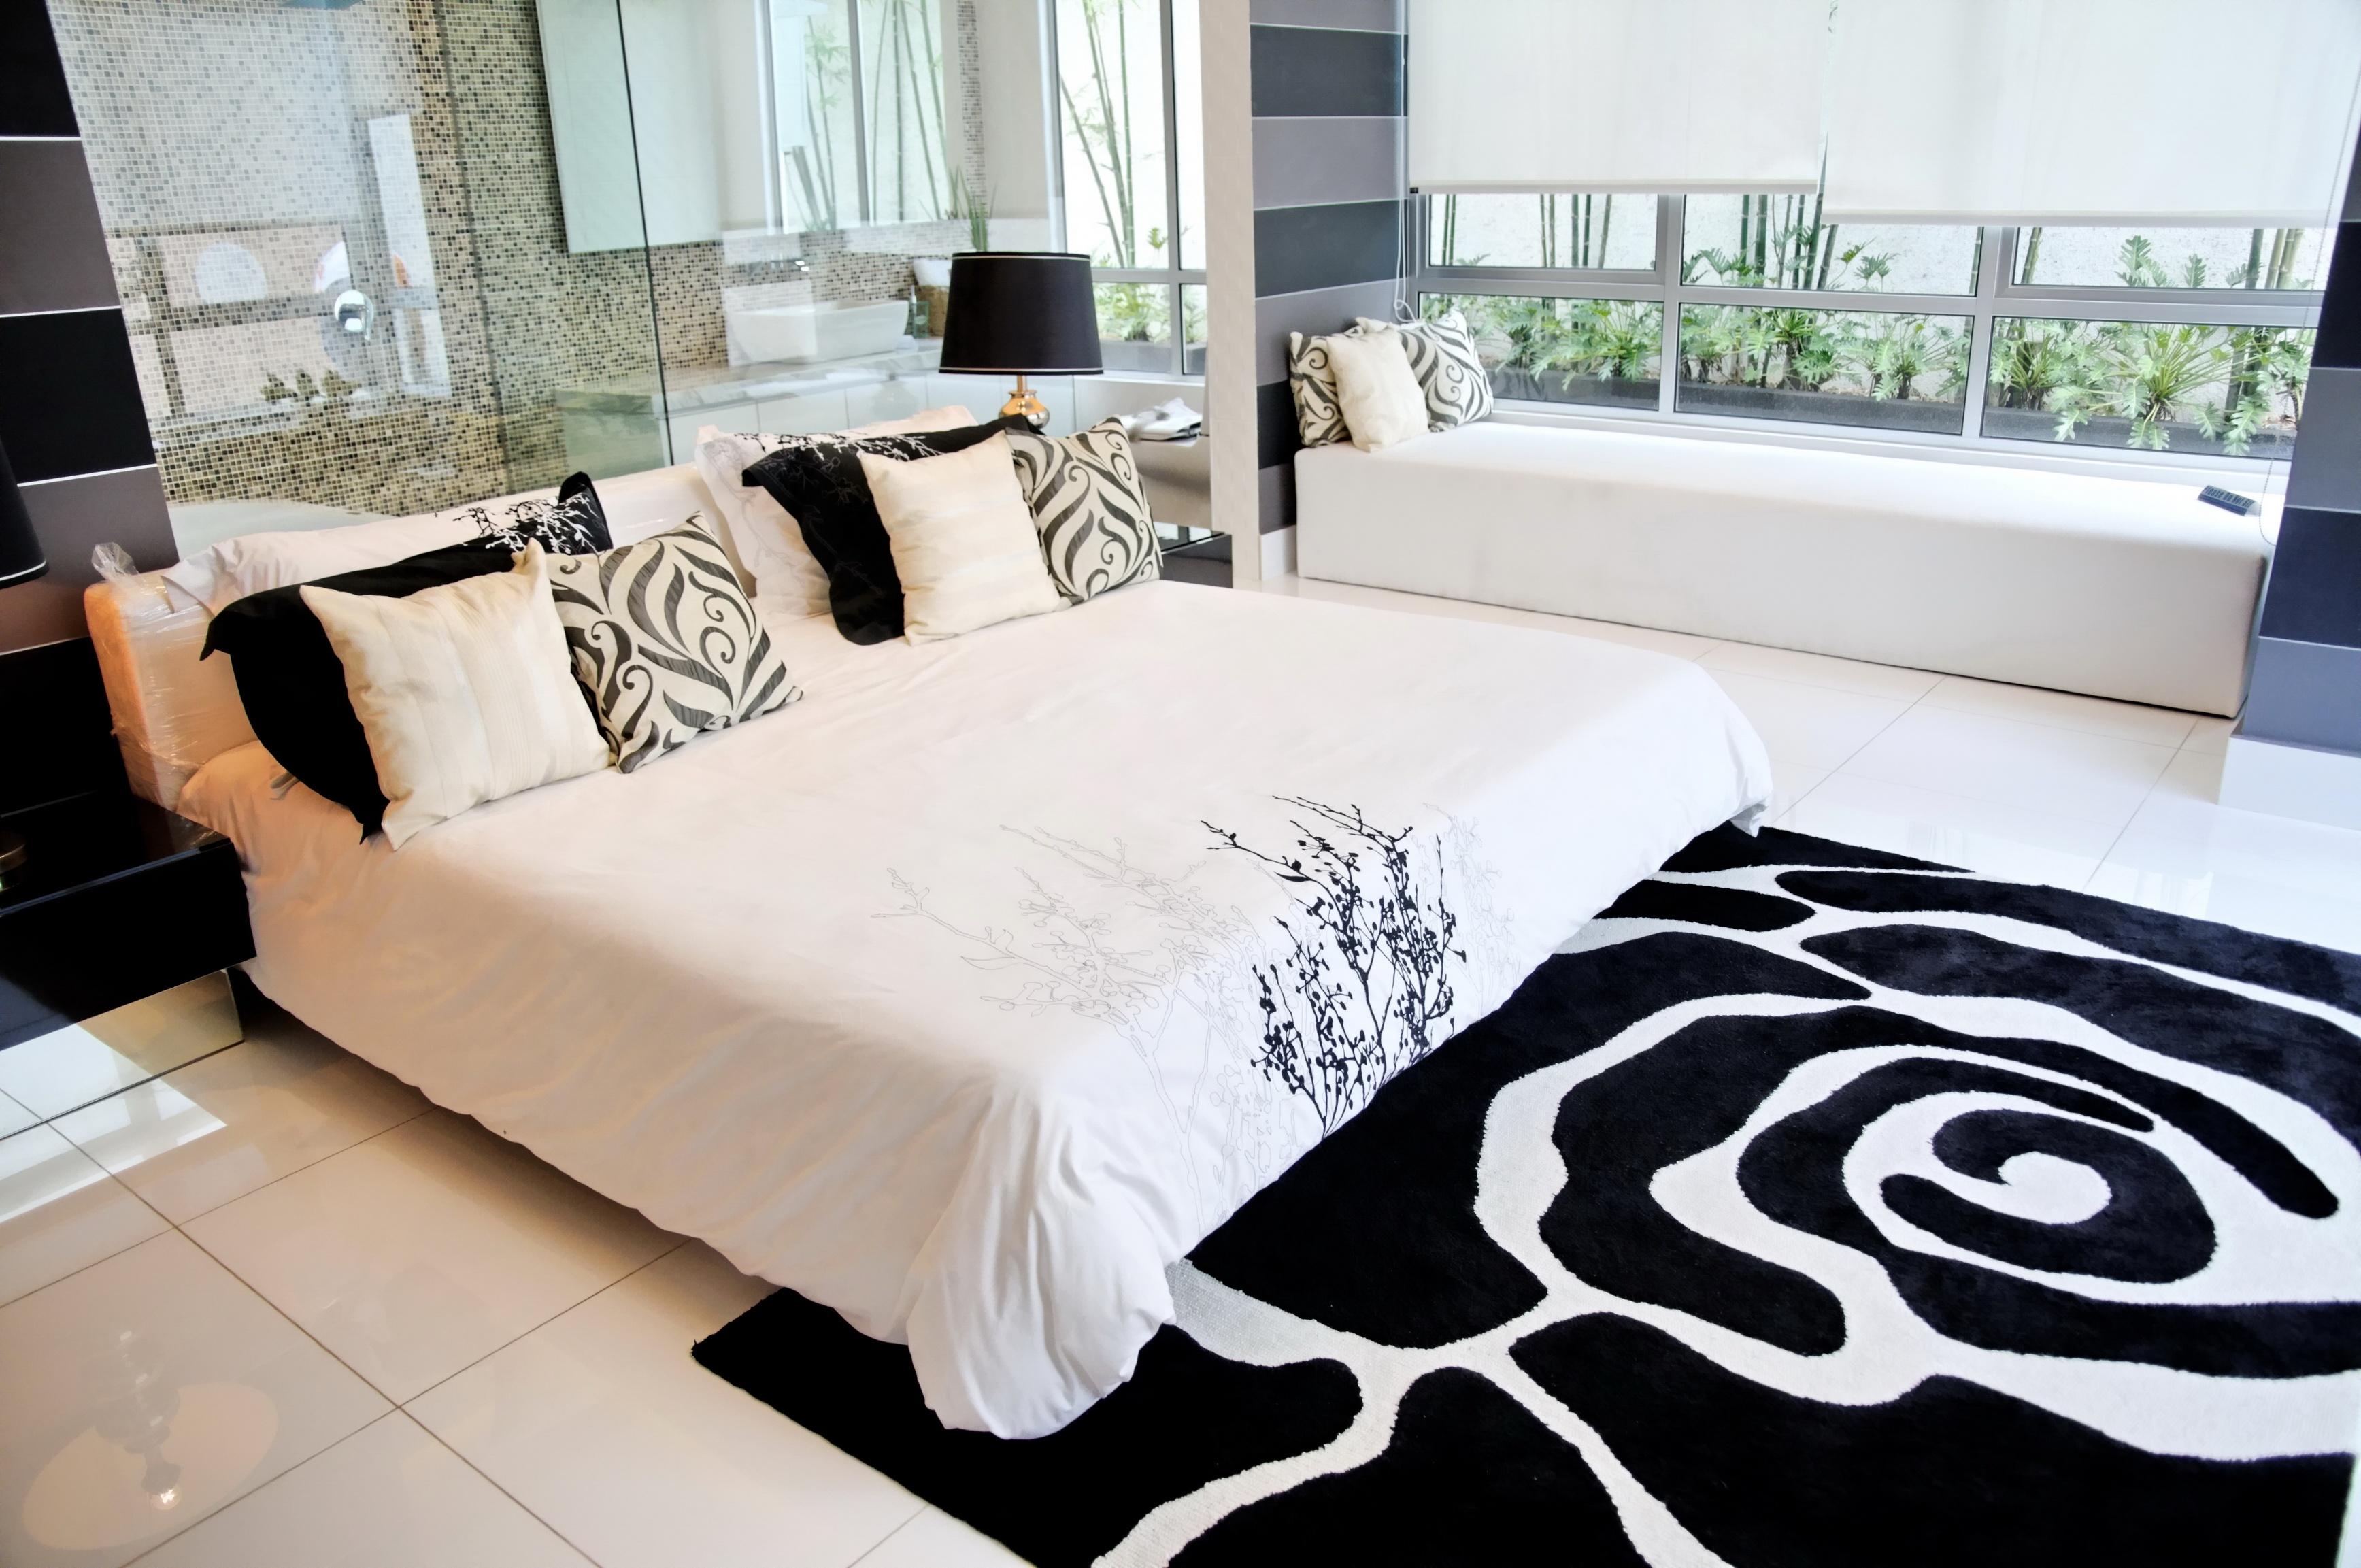 utiliza-camas-king-o-queen-en-tu-dormitorio.jpg